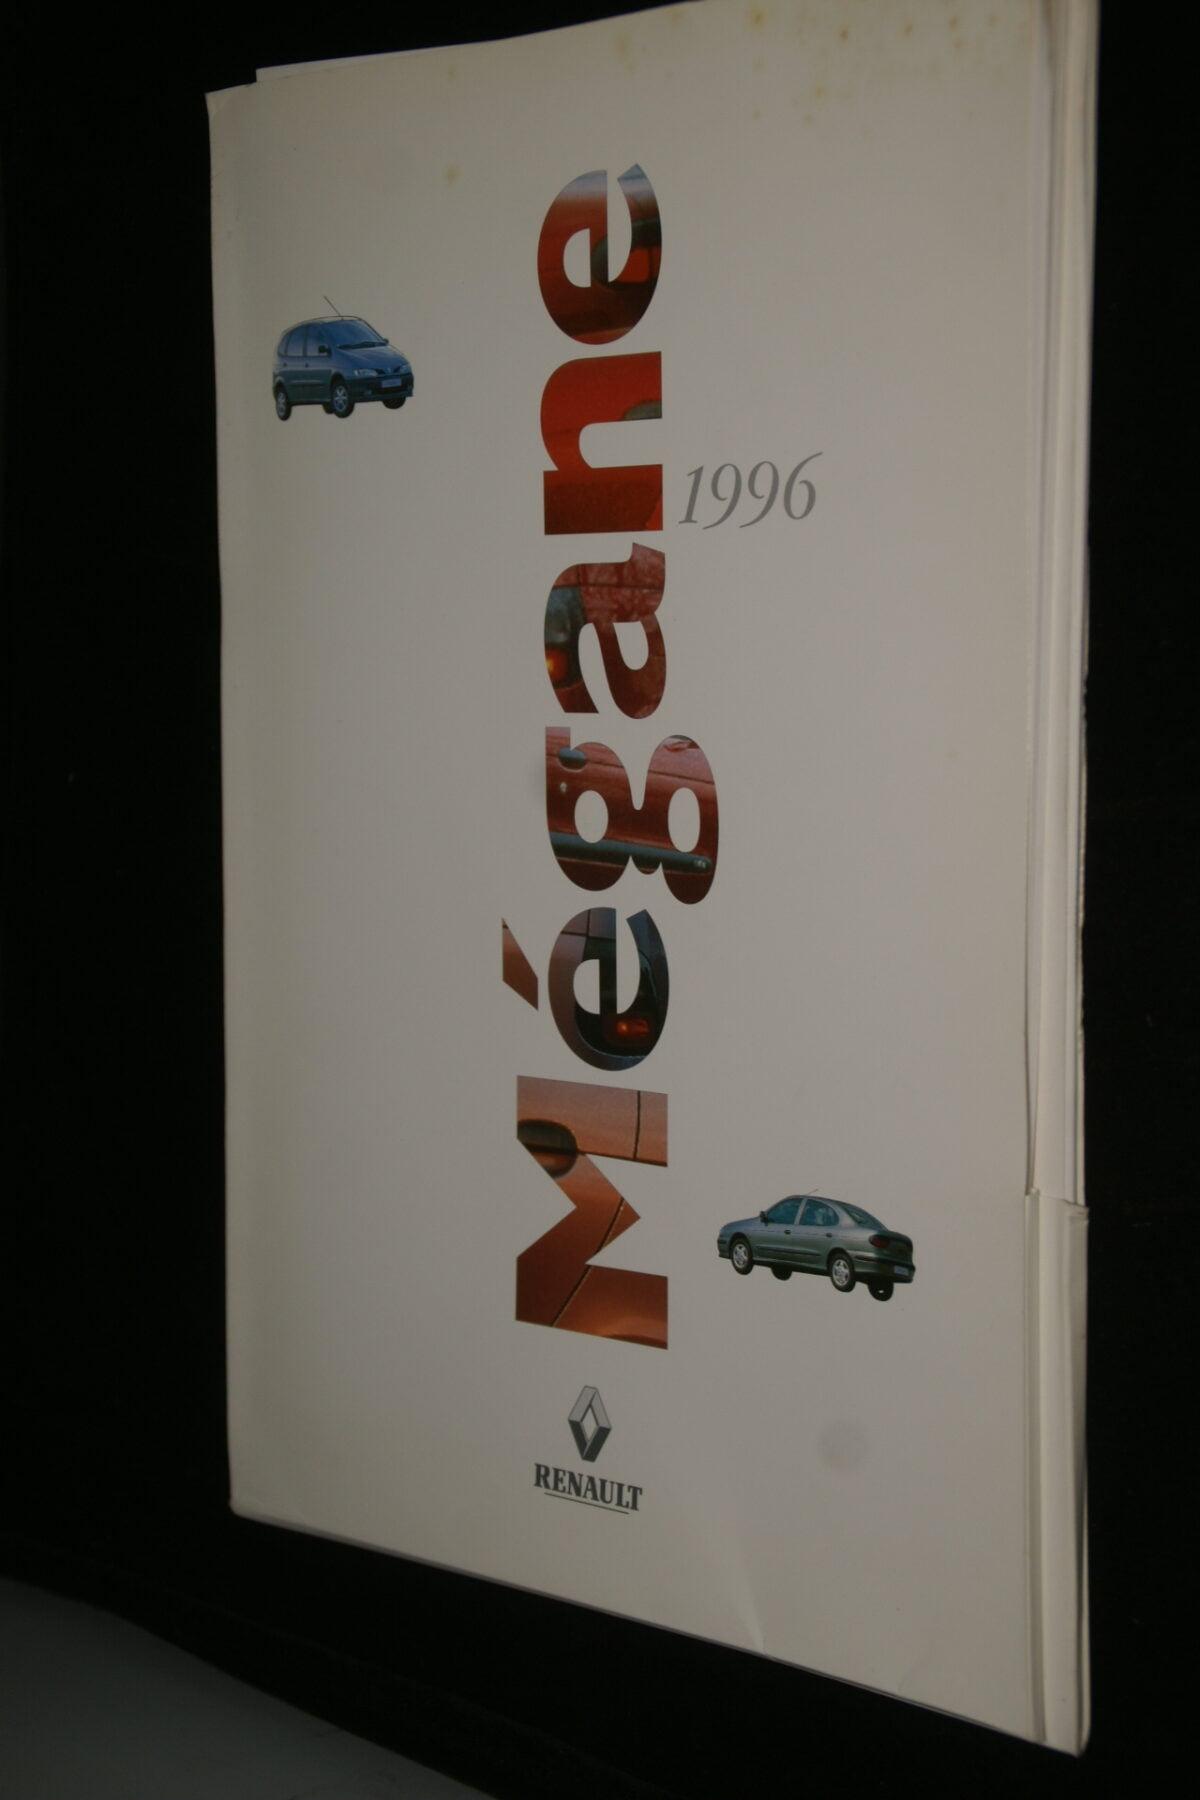 DSC09990 1996 originele persmap Renault Megane-bd75eedc